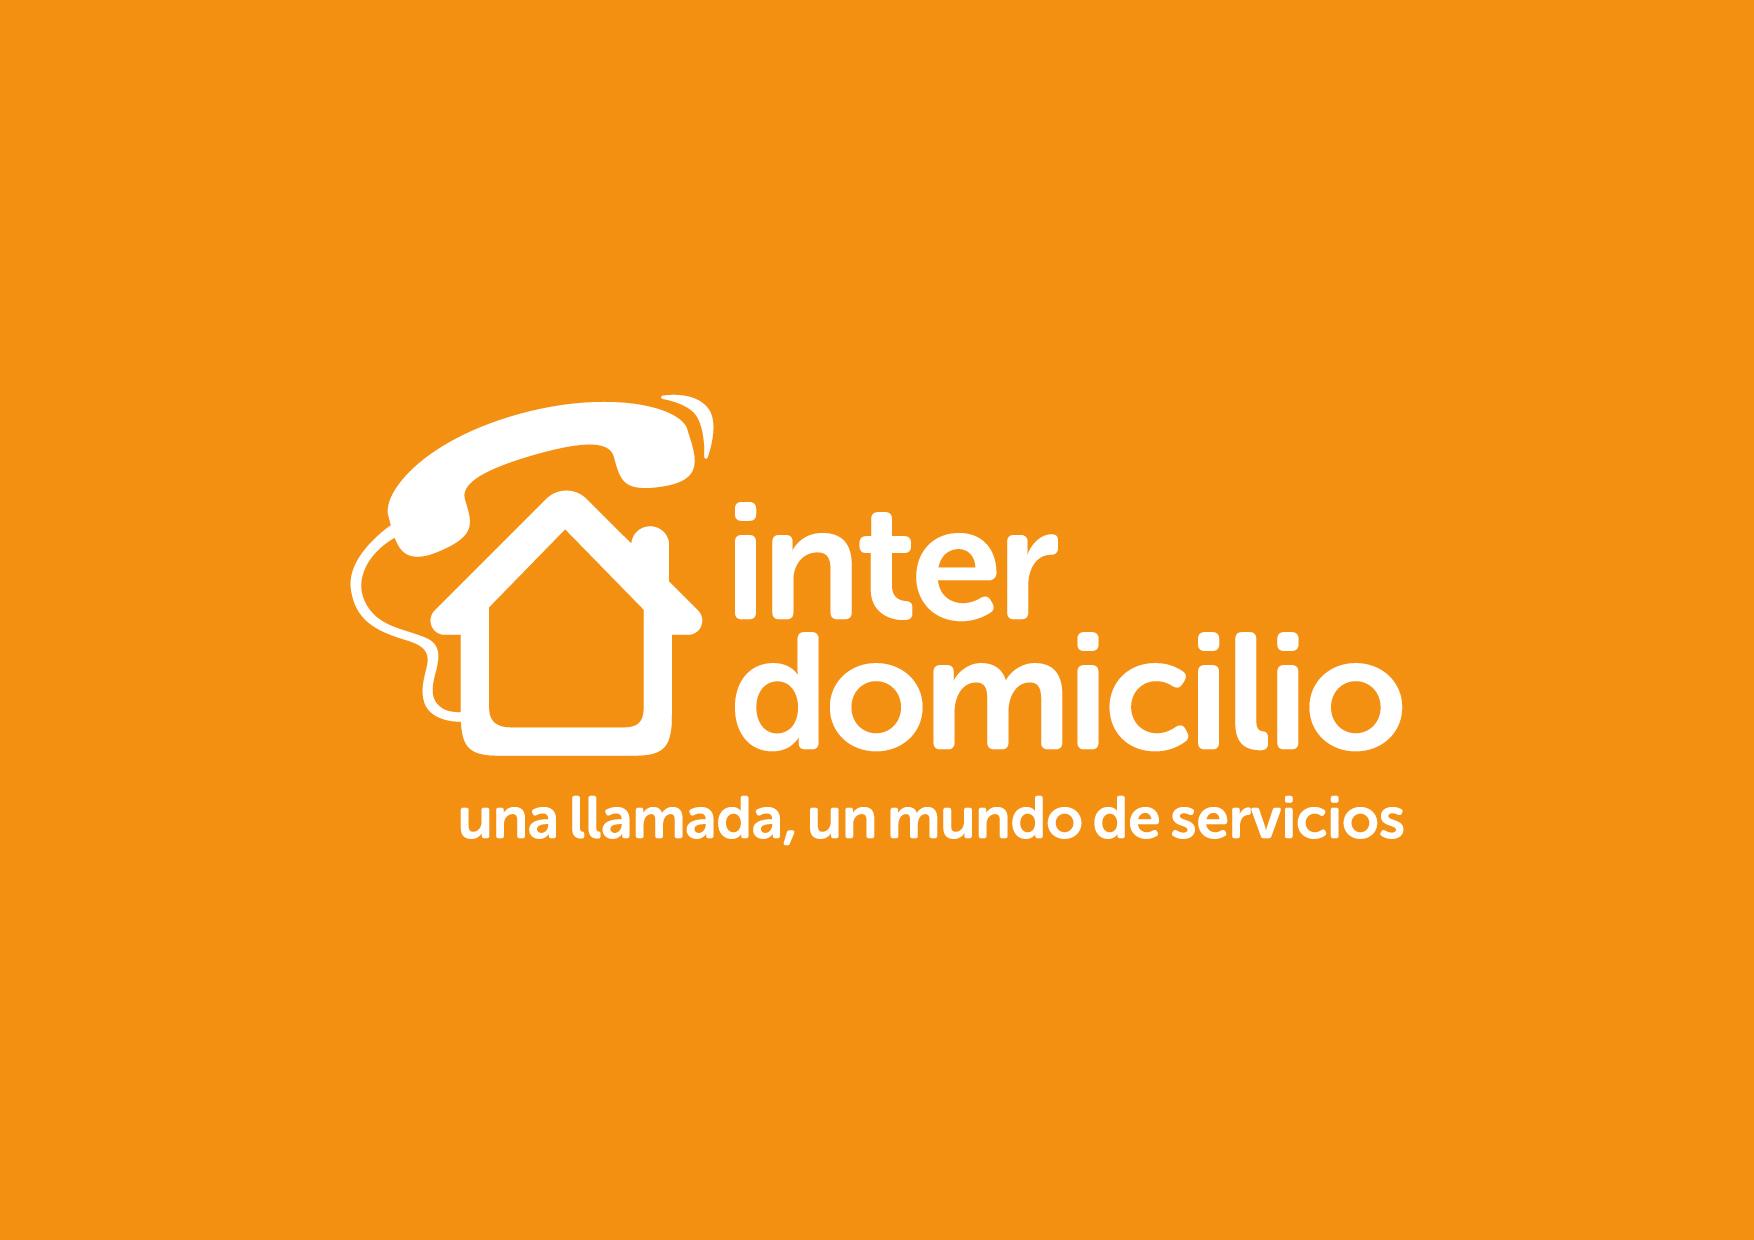 Interdomicilio Alcobendas